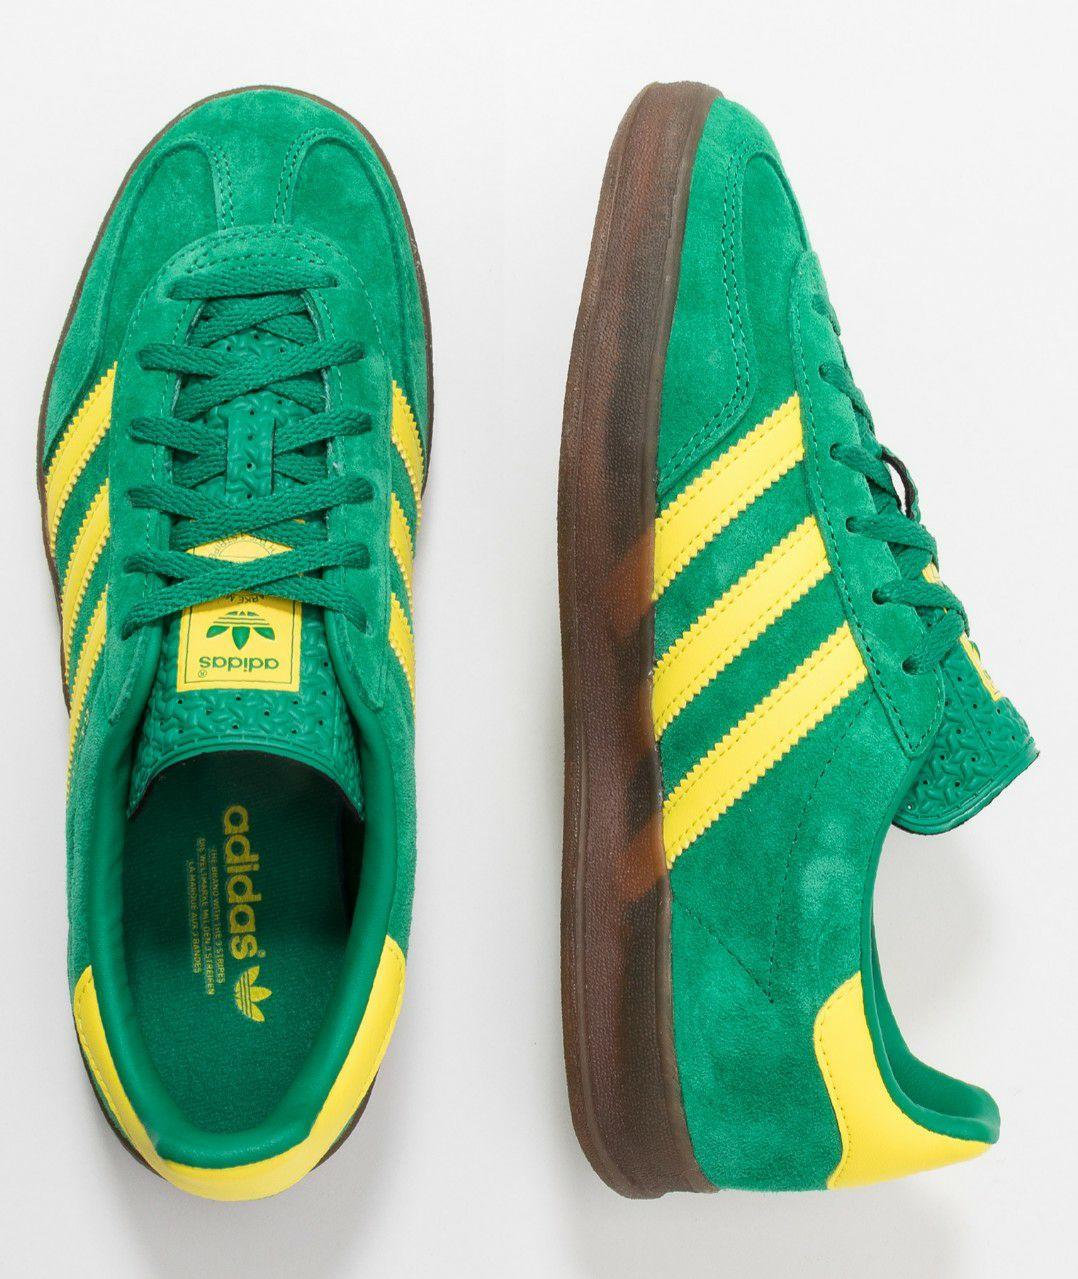 Adidas Gazelle Indoor Trainers £48.74 @ Zalando